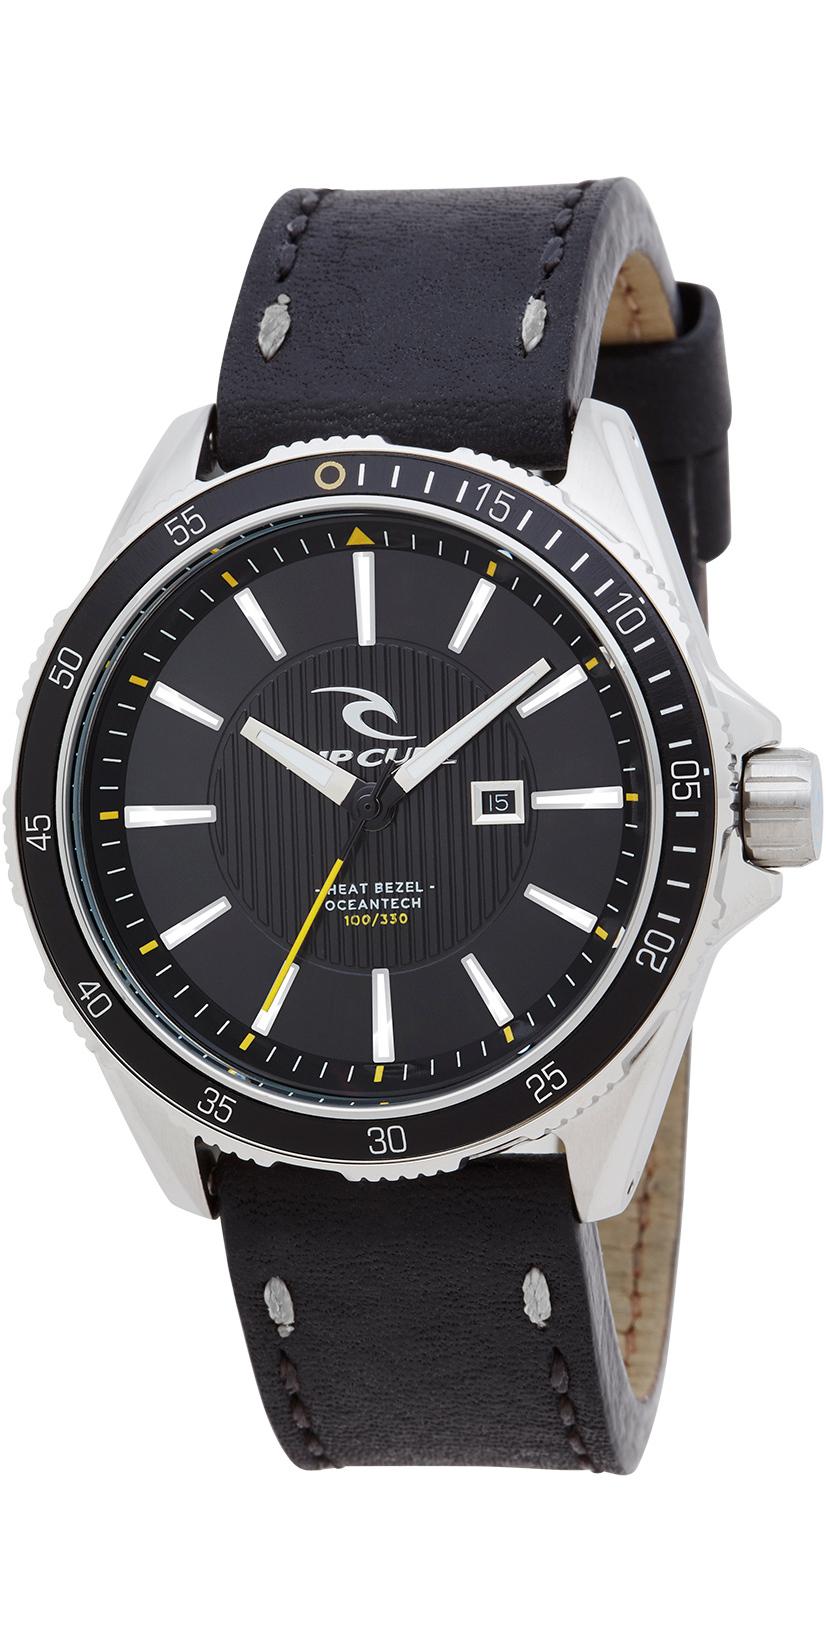 2017 rip curl diver 100 leather strap watch black a2893 a2893 2017 rip curl diver 100 leather strap watch black a2893